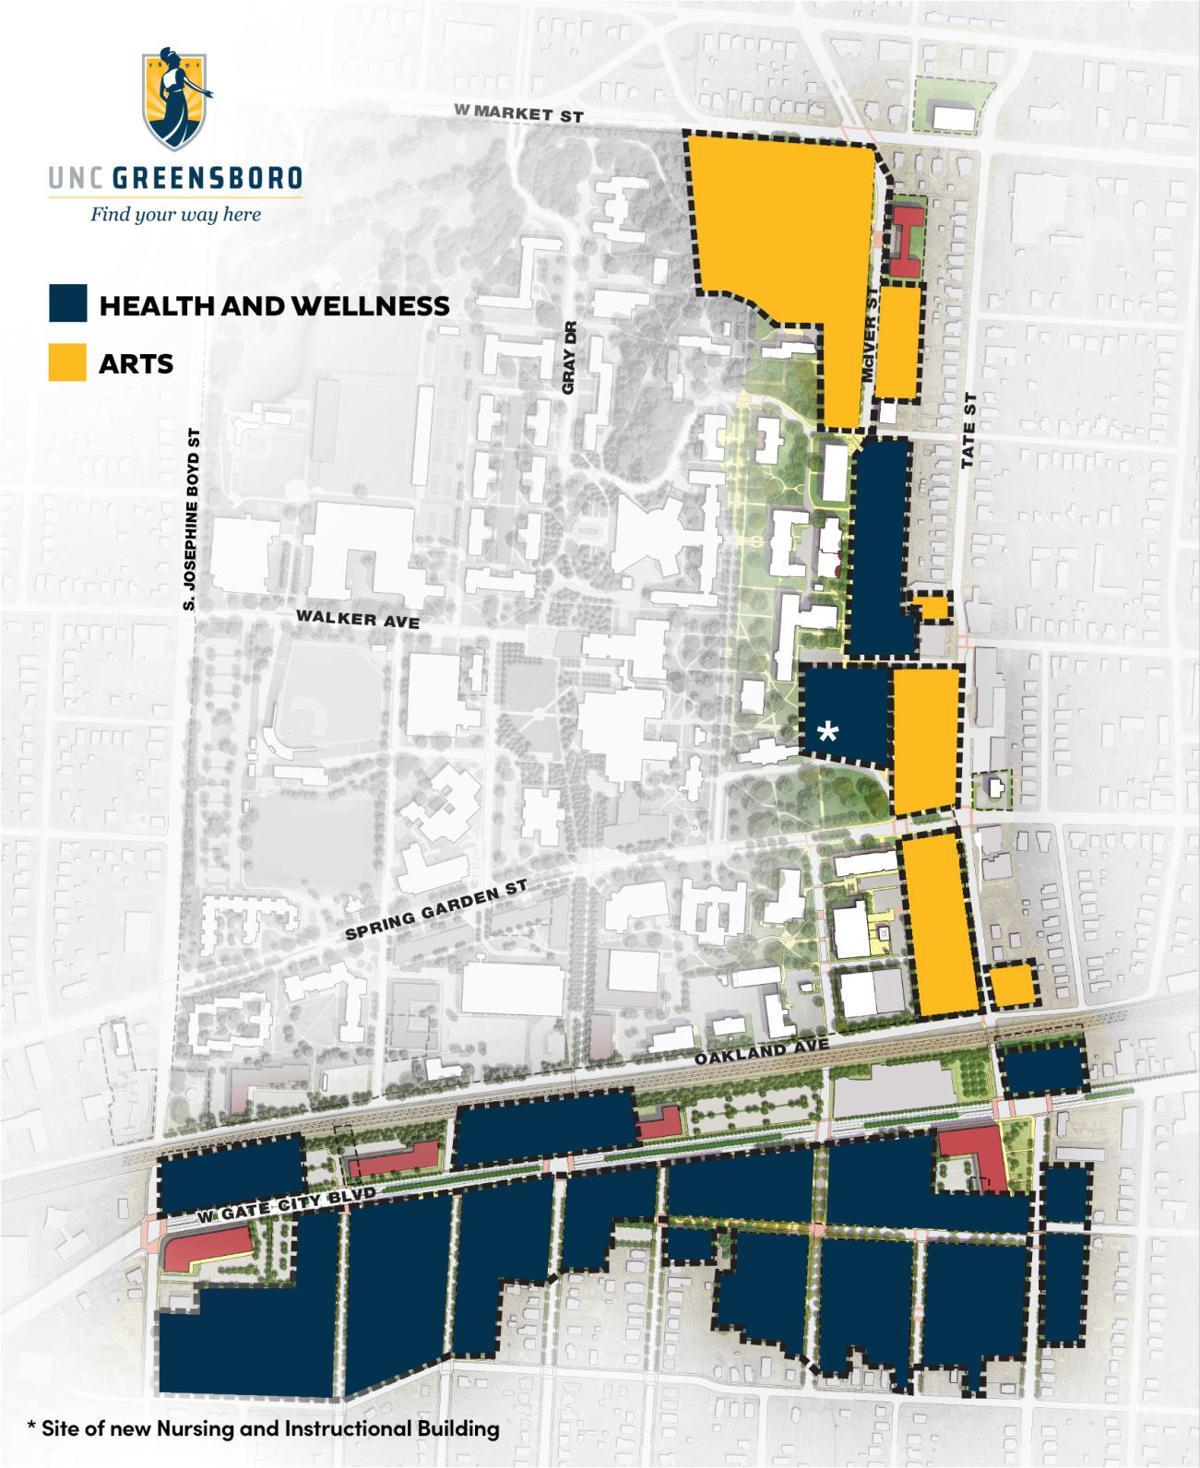 UNCG Millennial Campus districts 2019